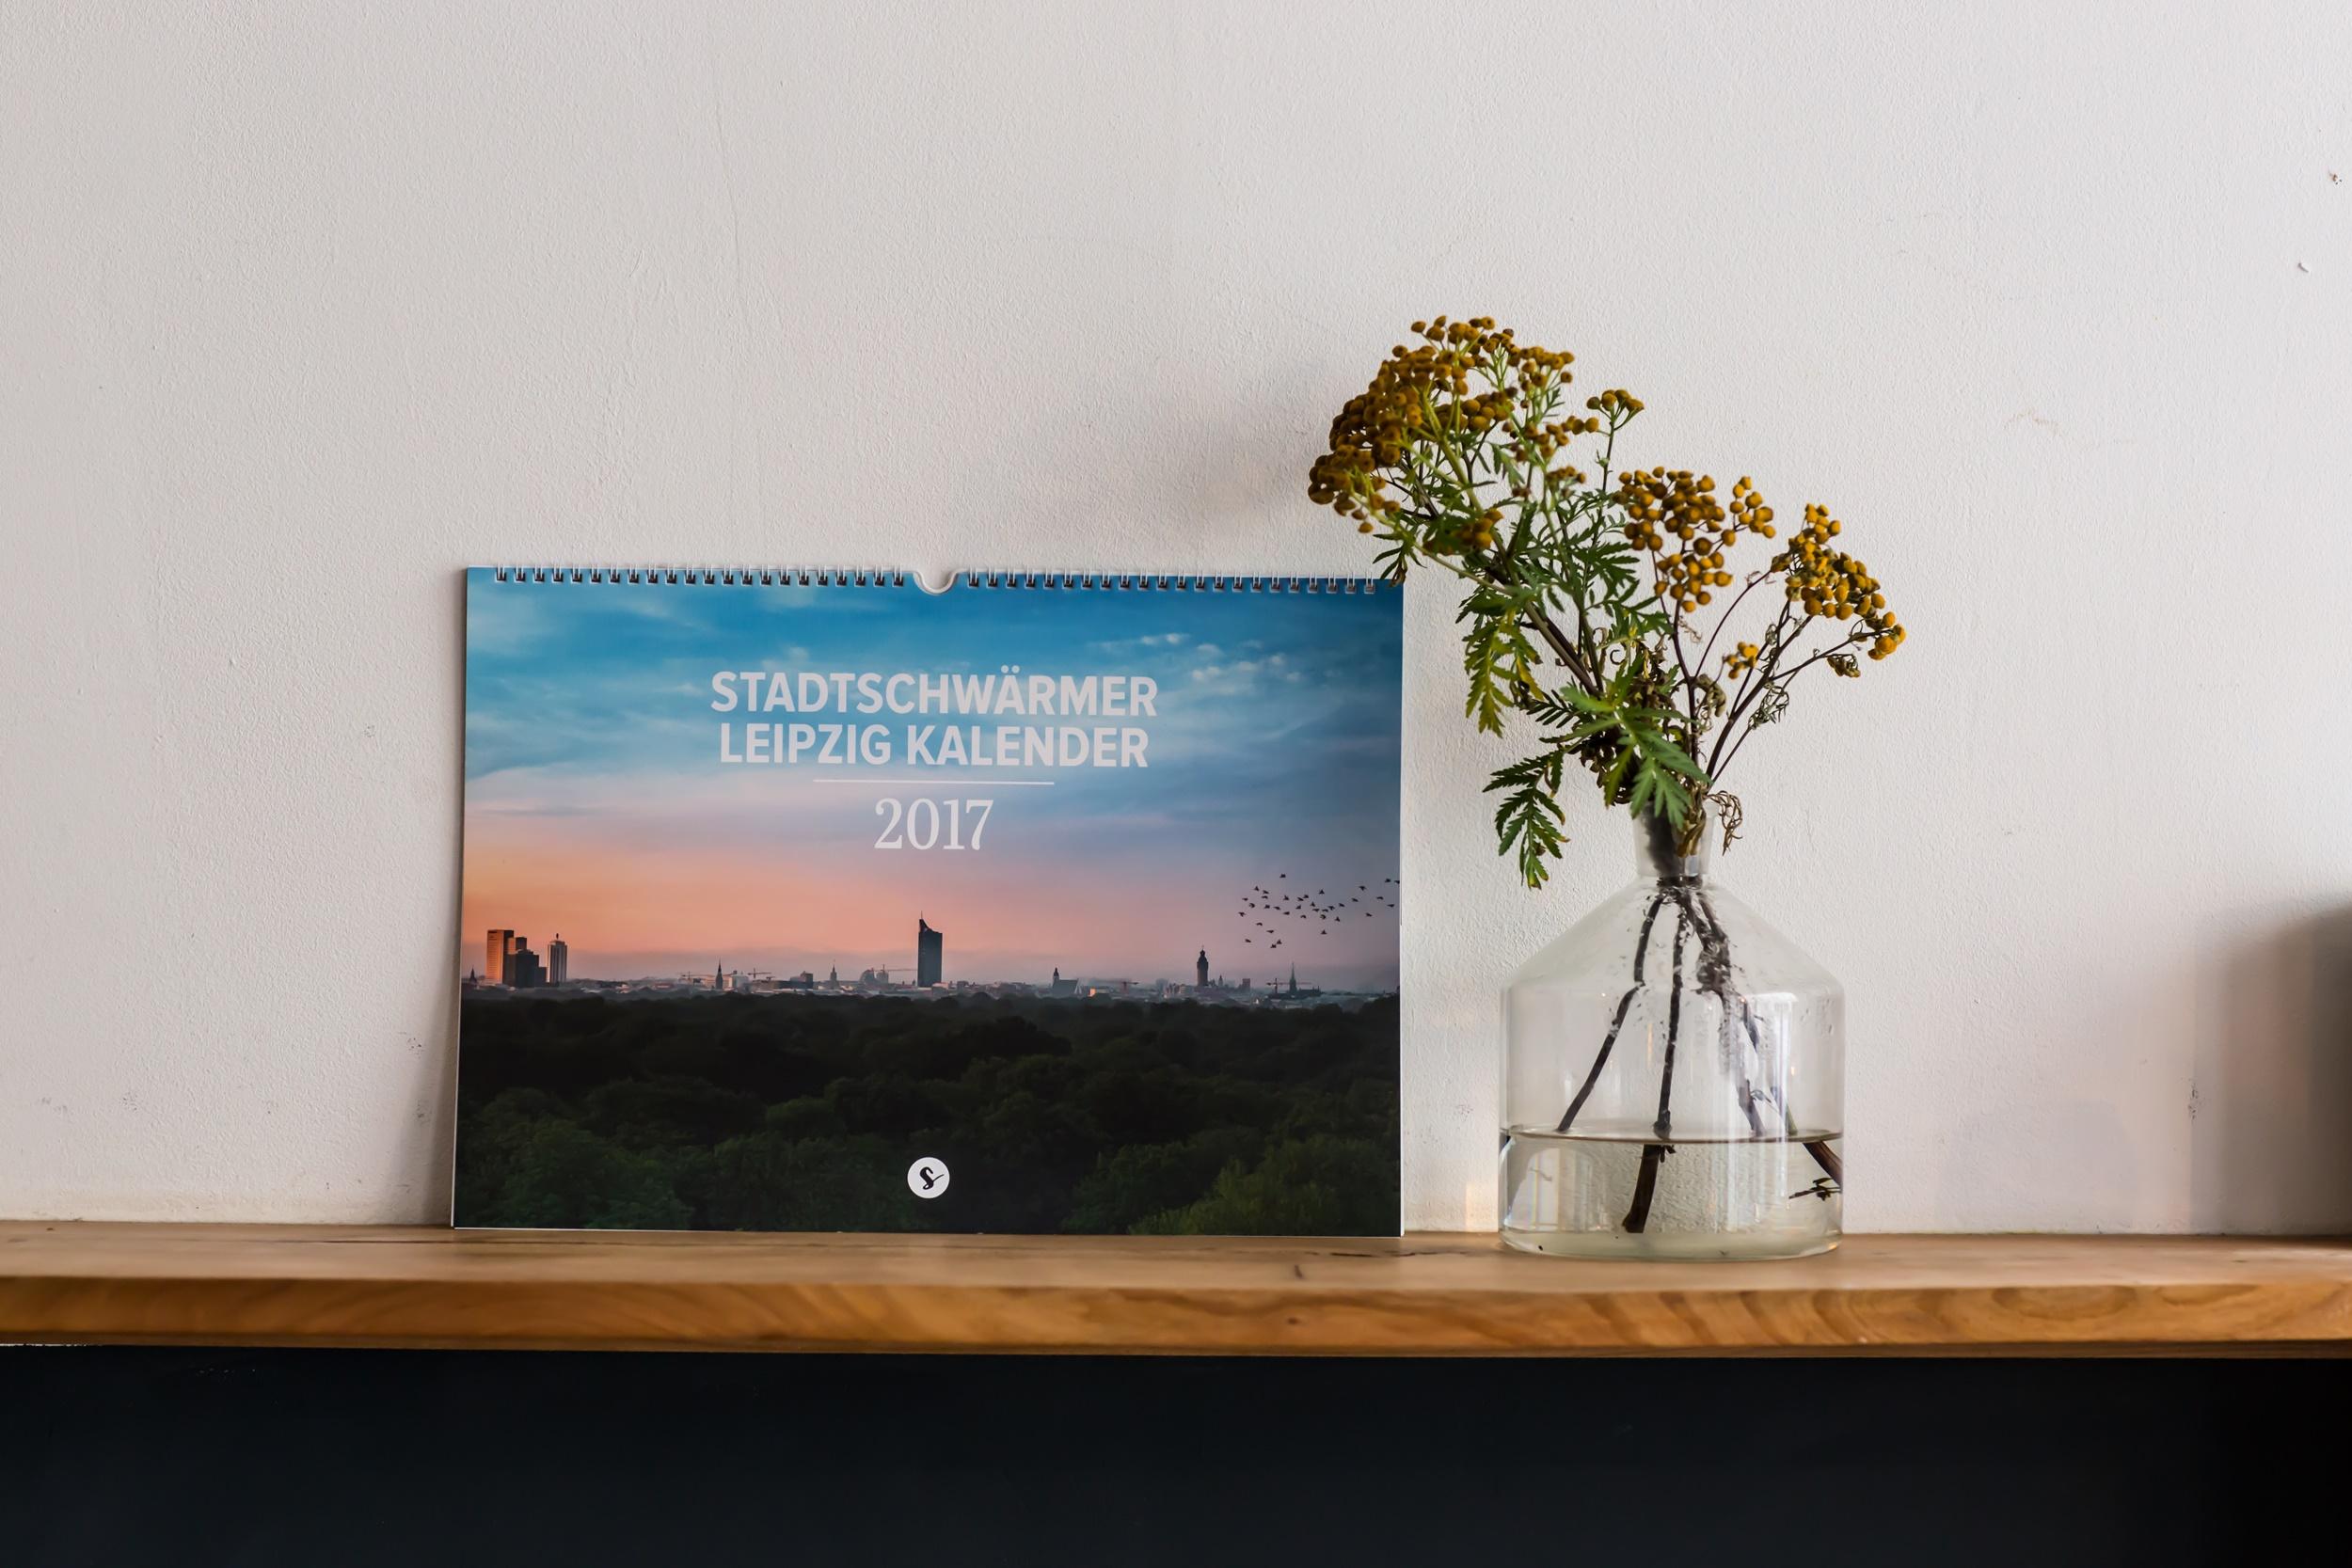 stadtschwaermer-leipzig-kalender-2017_6